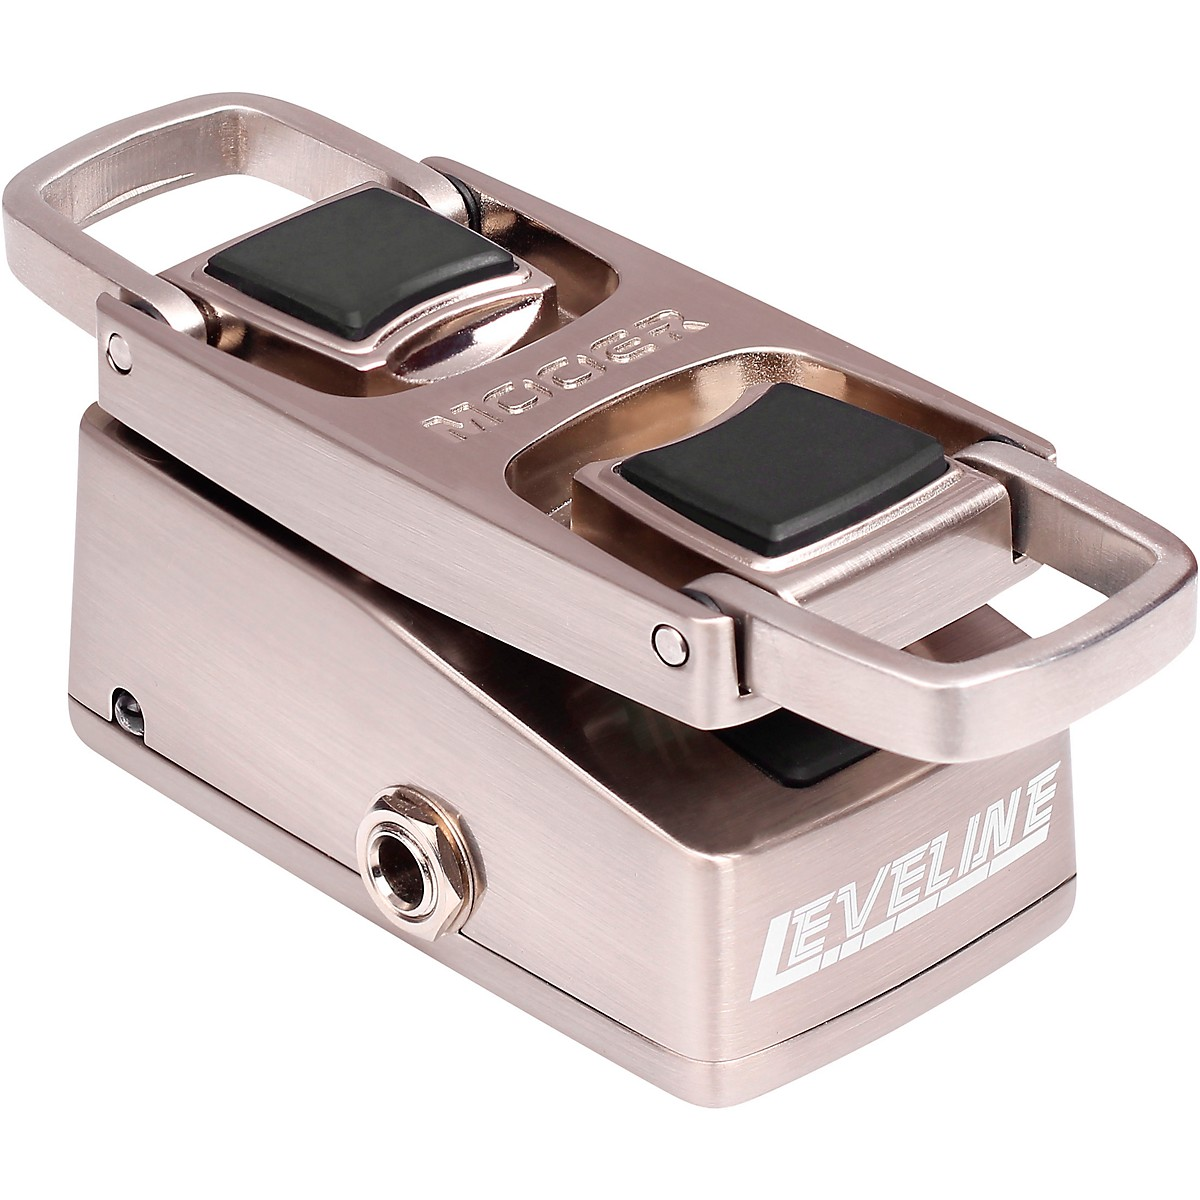 Mooer Leveline Mini Volume Pedal